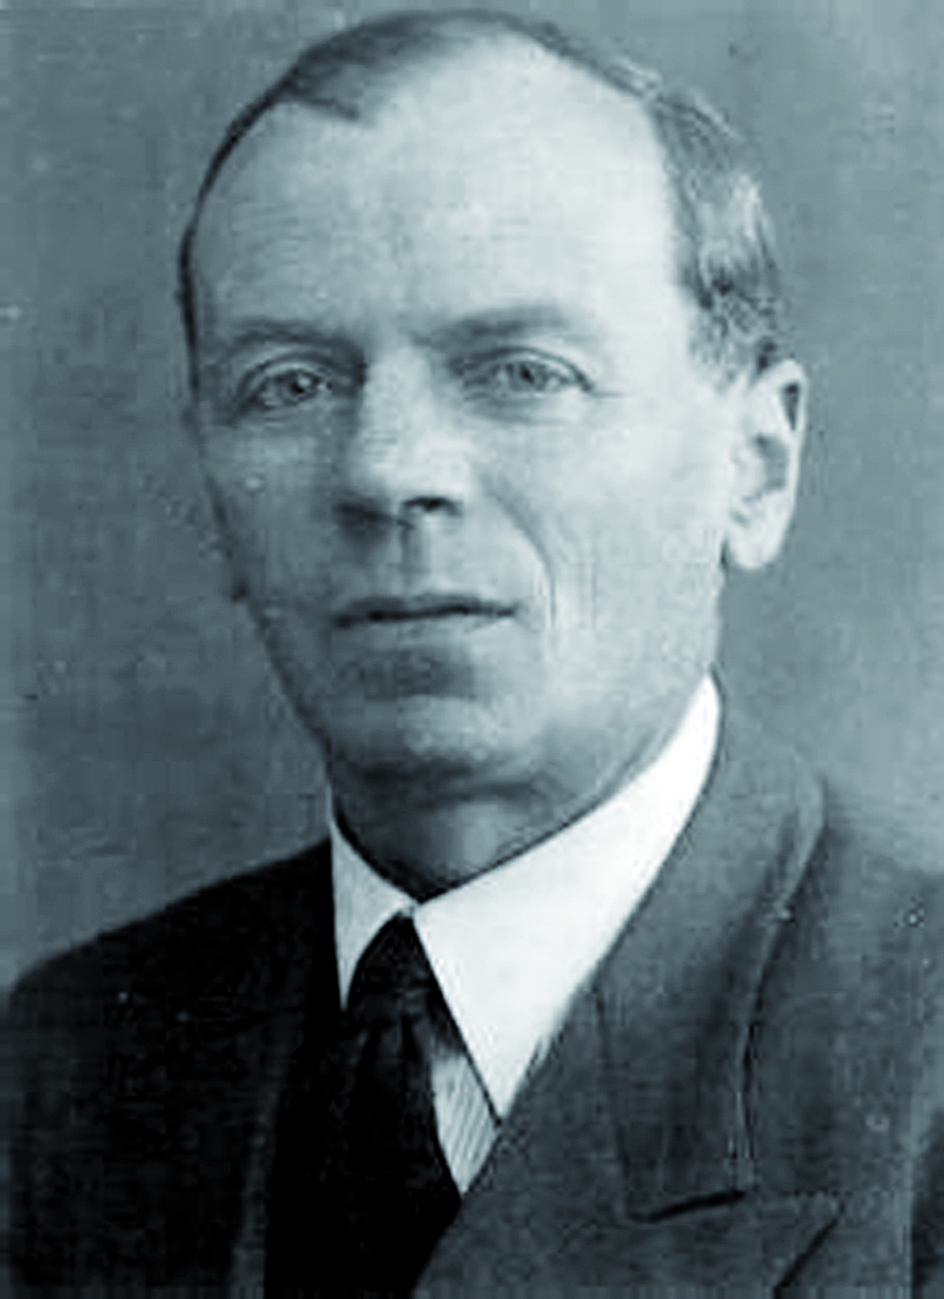 Portraitfoto von Herrn Kuhlenkampf.